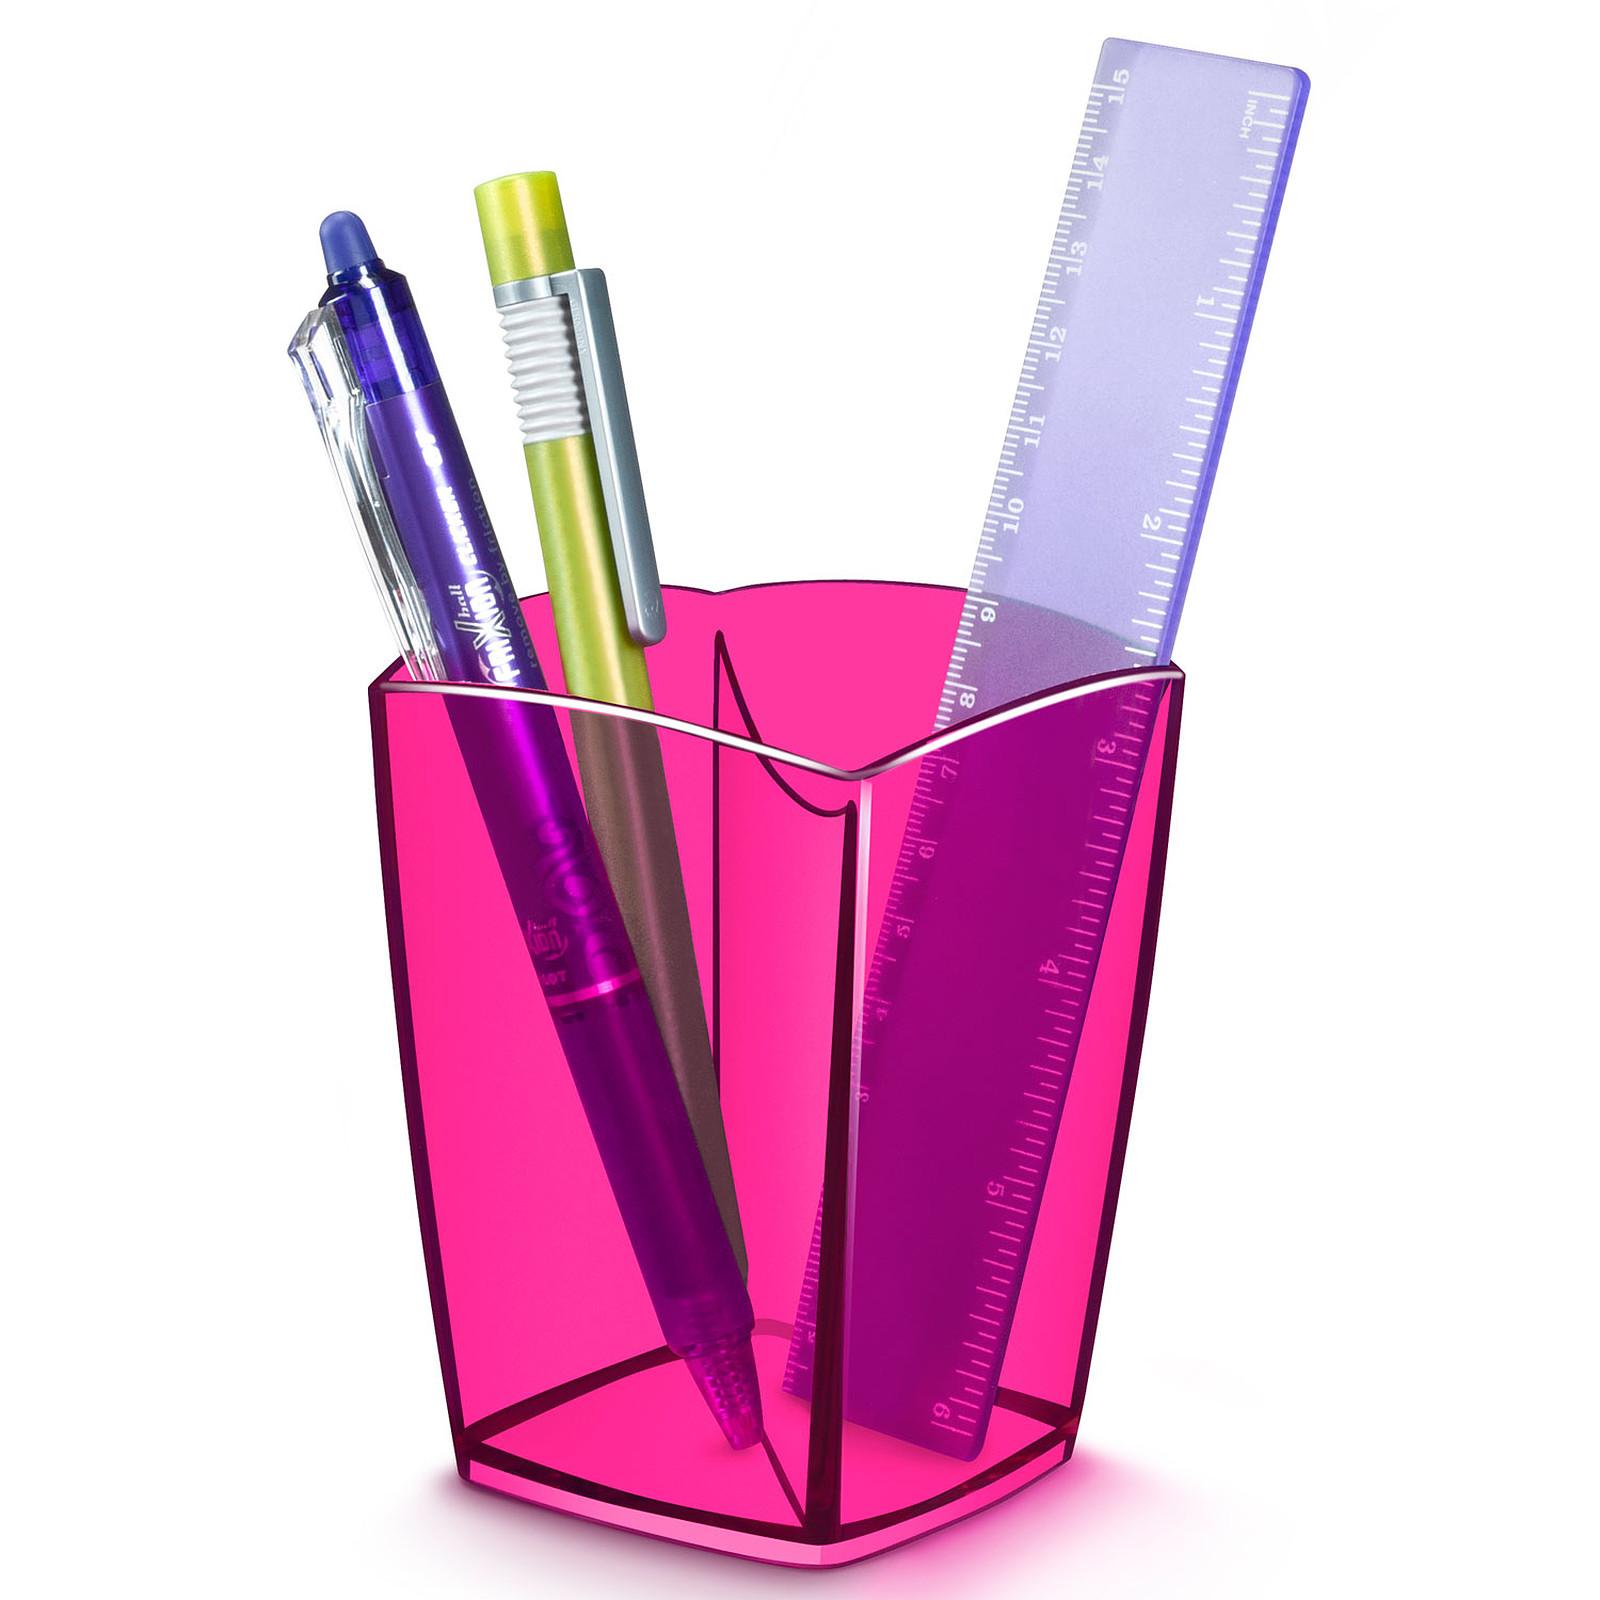 cep ceppro happy pot crayons rose indien pot crayon. Black Bedroom Furniture Sets. Home Design Ideas